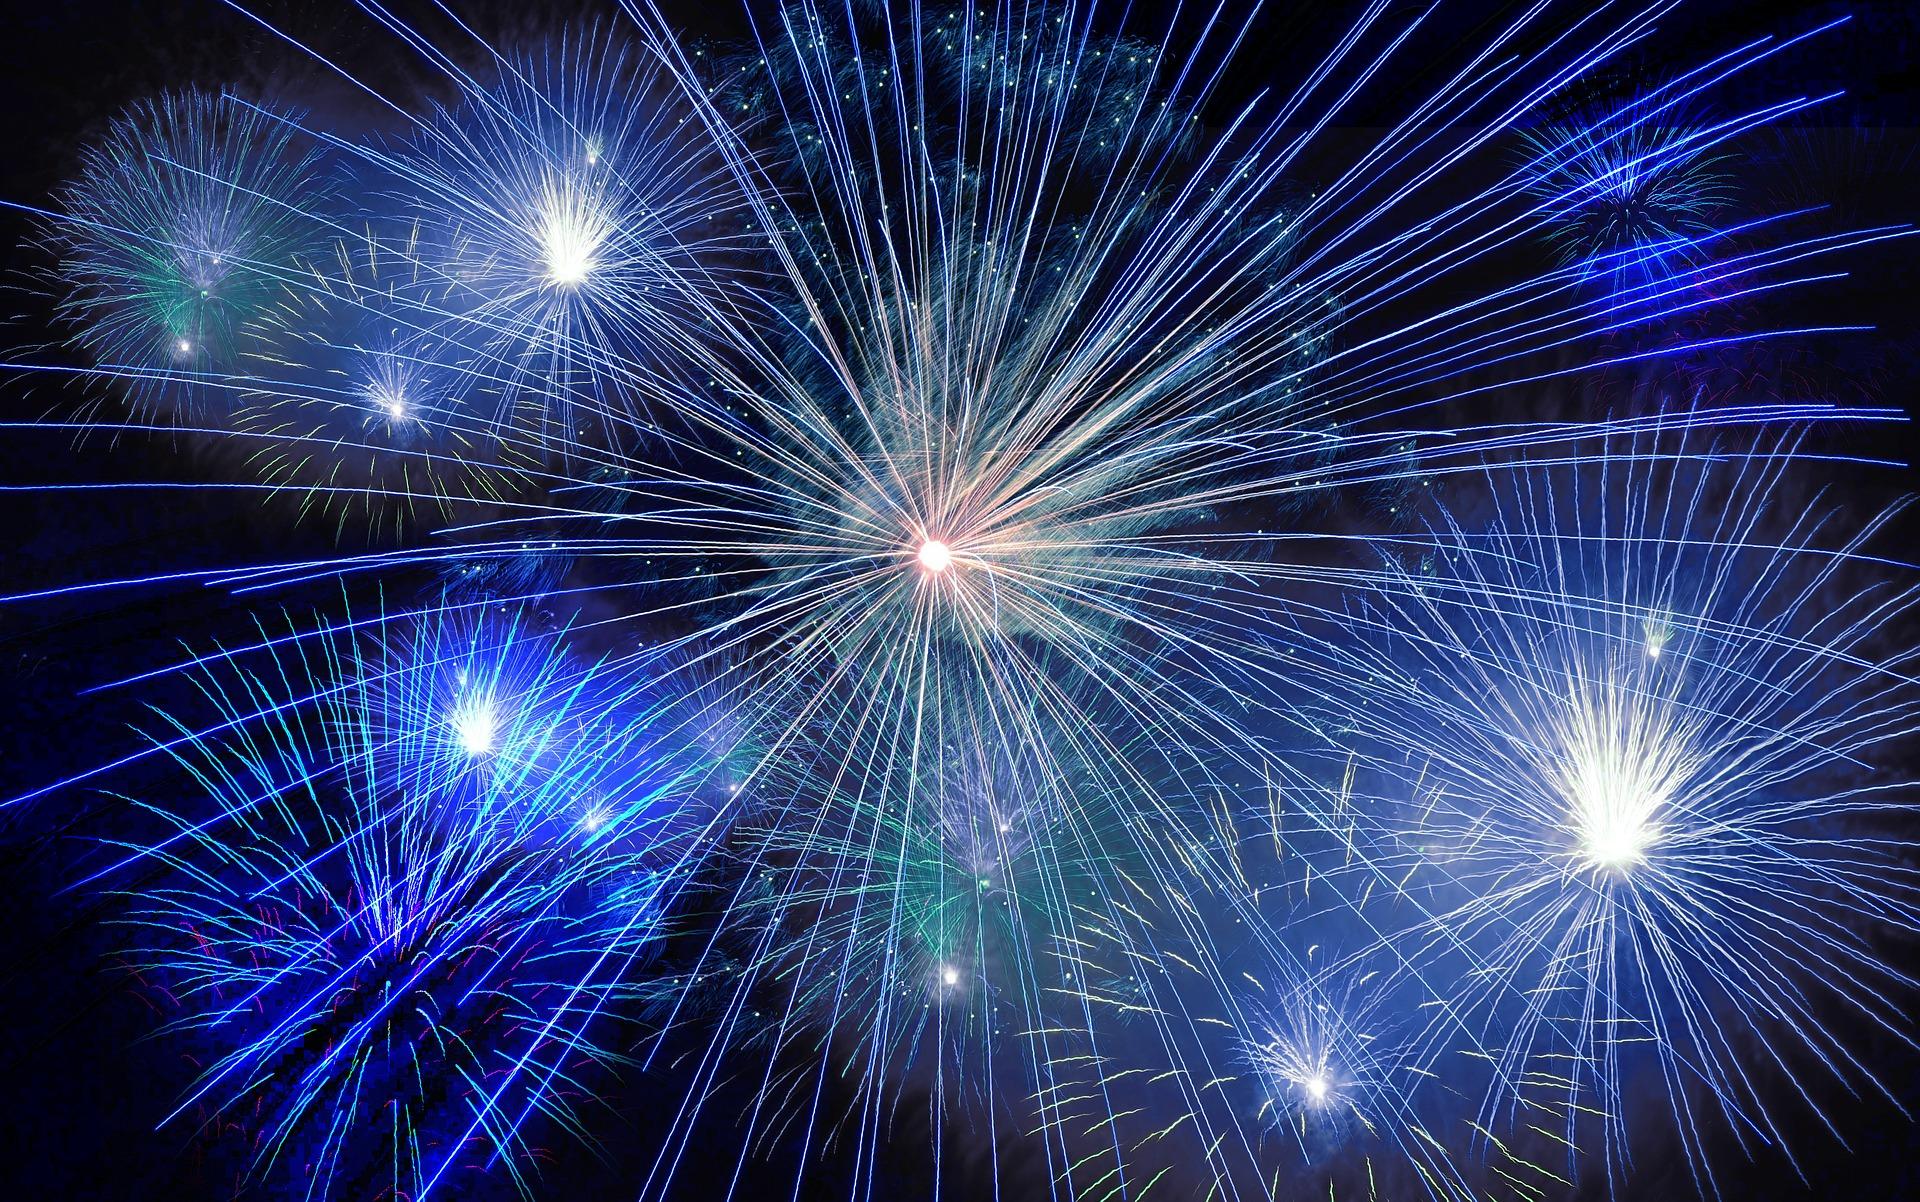 fireworks-574739_1920.jpg